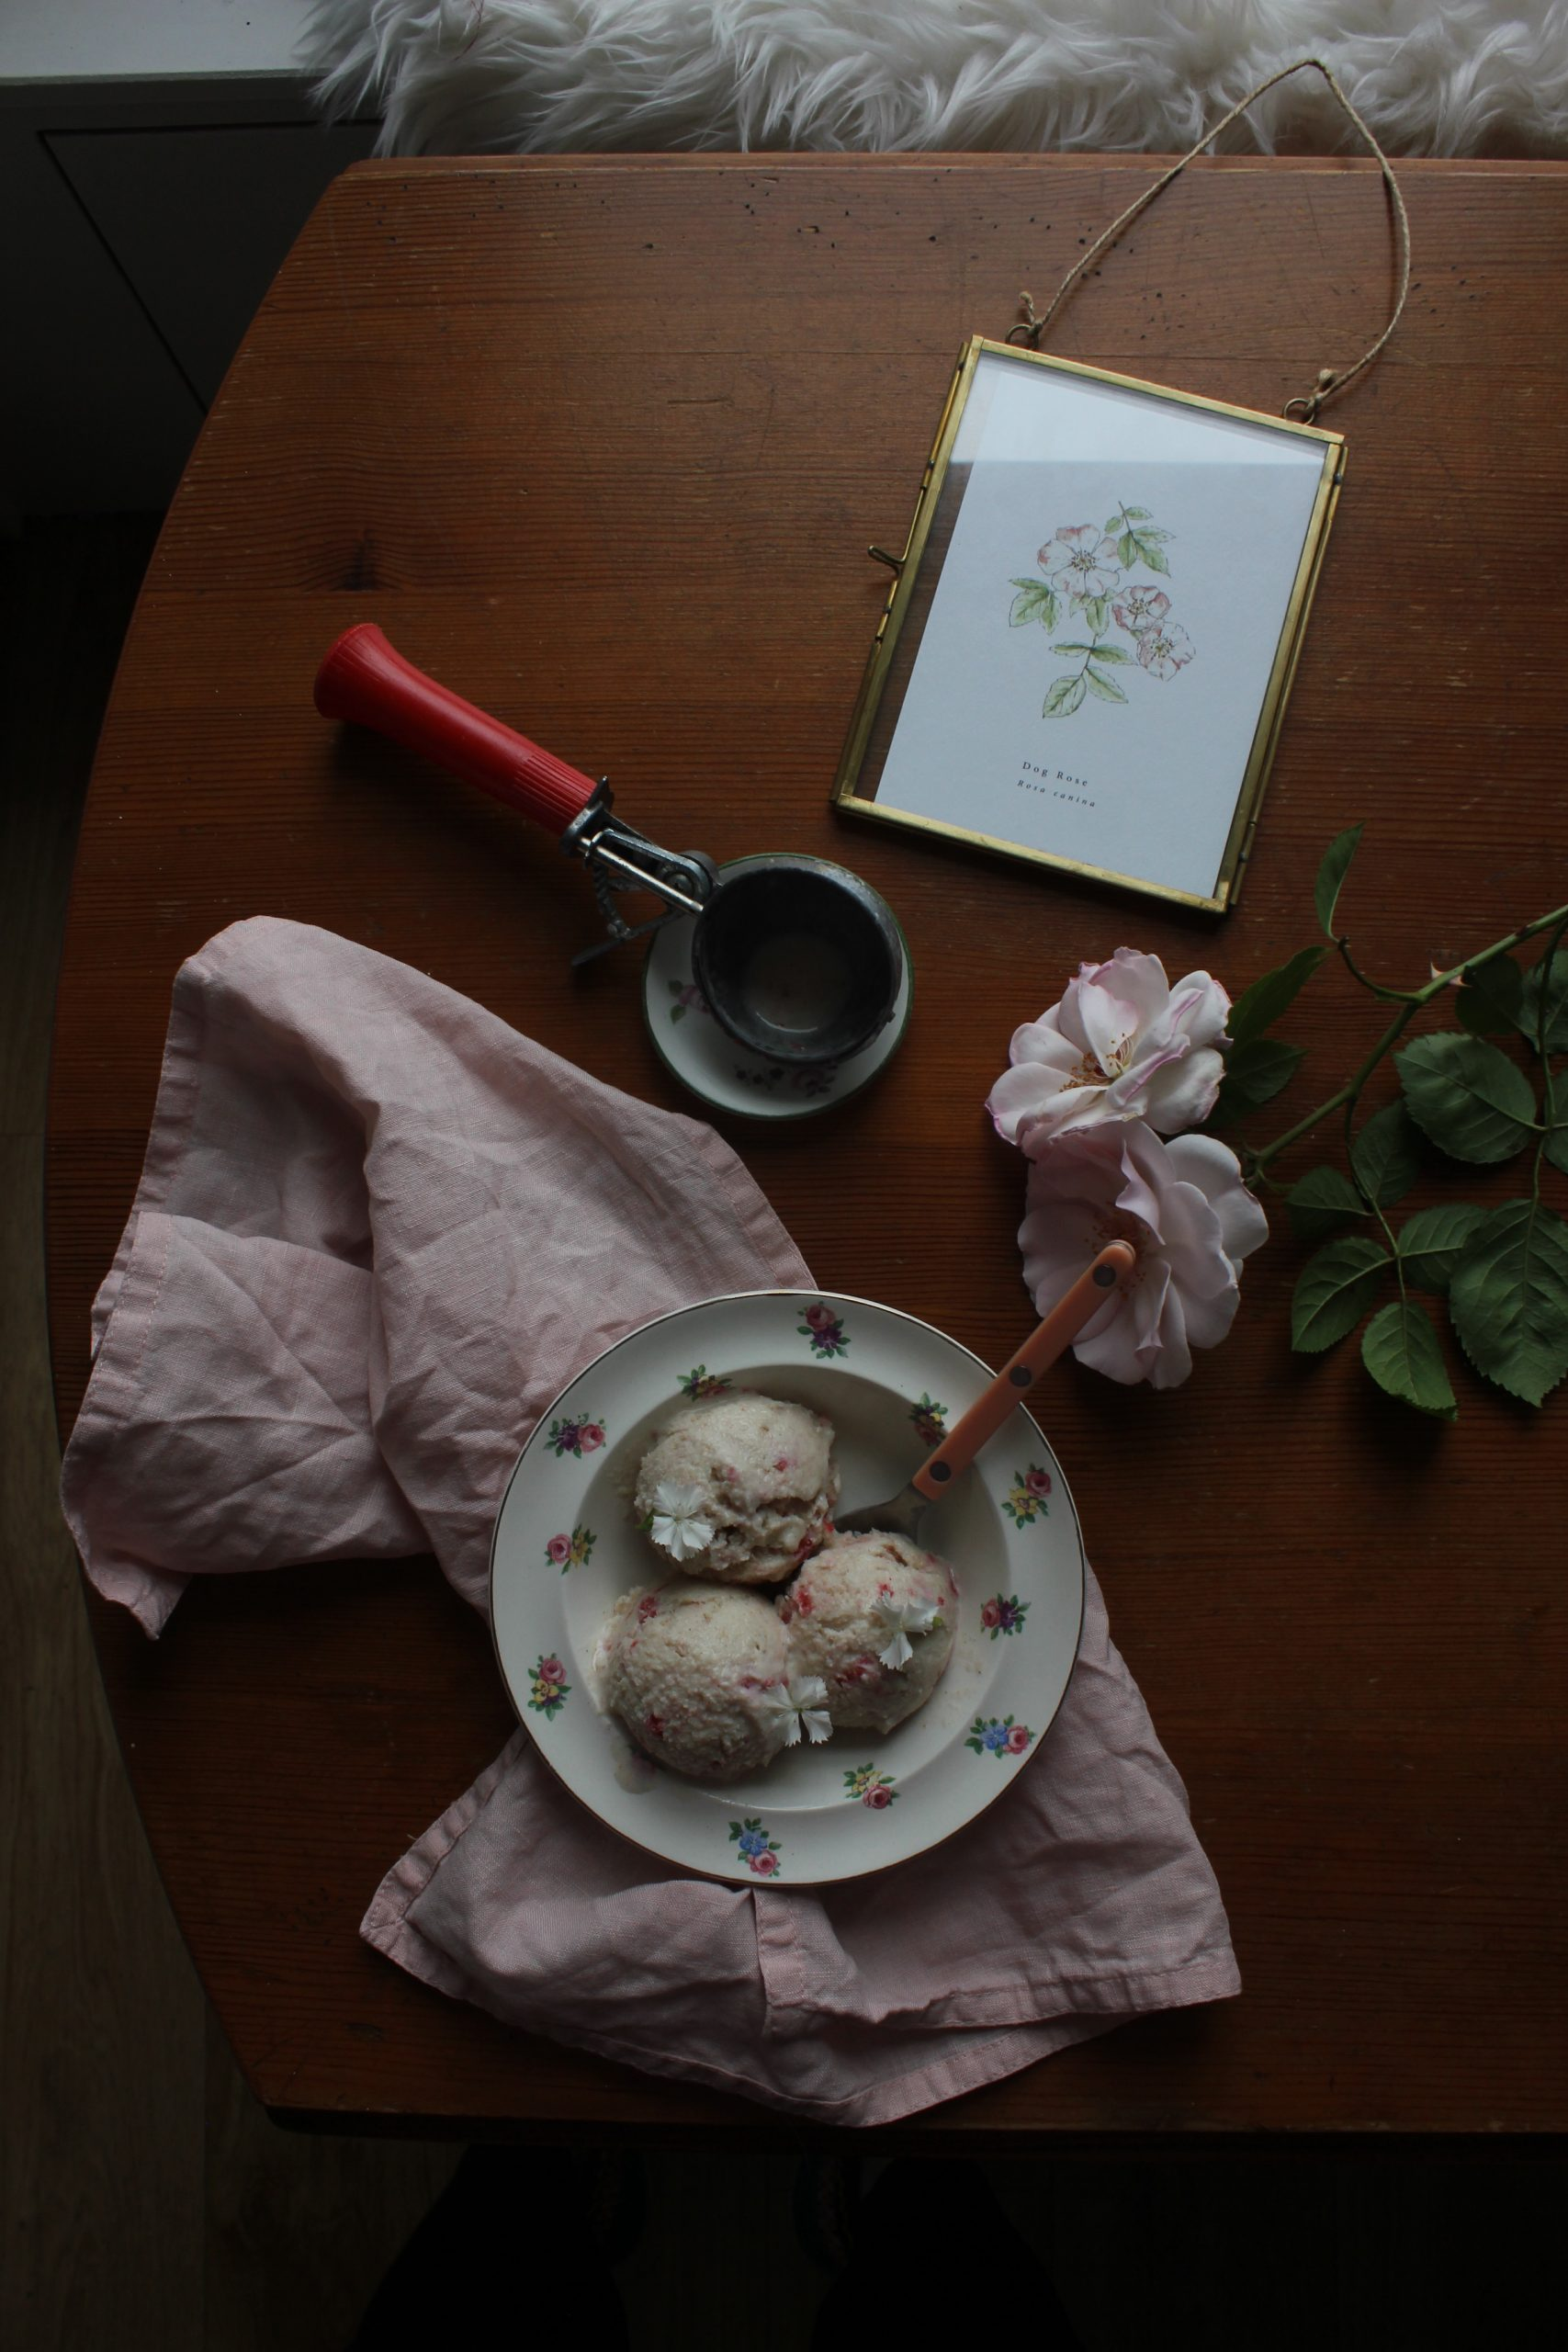 Strawberry and Cardamom Frozen Yoghurt